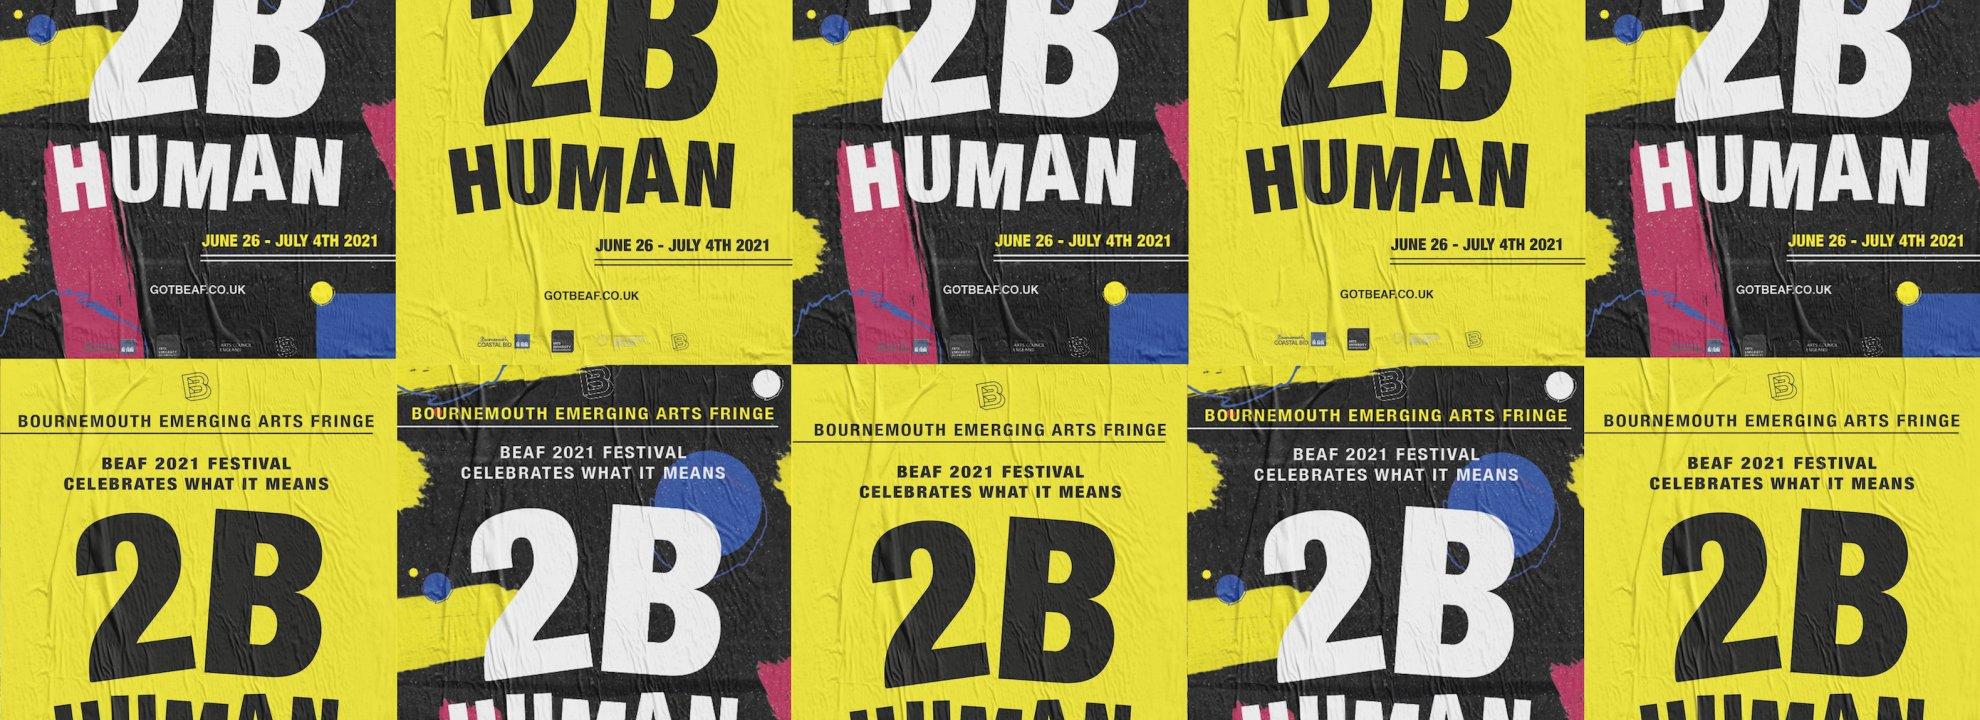 BEAF Festival 2021 - 2B Human Banner